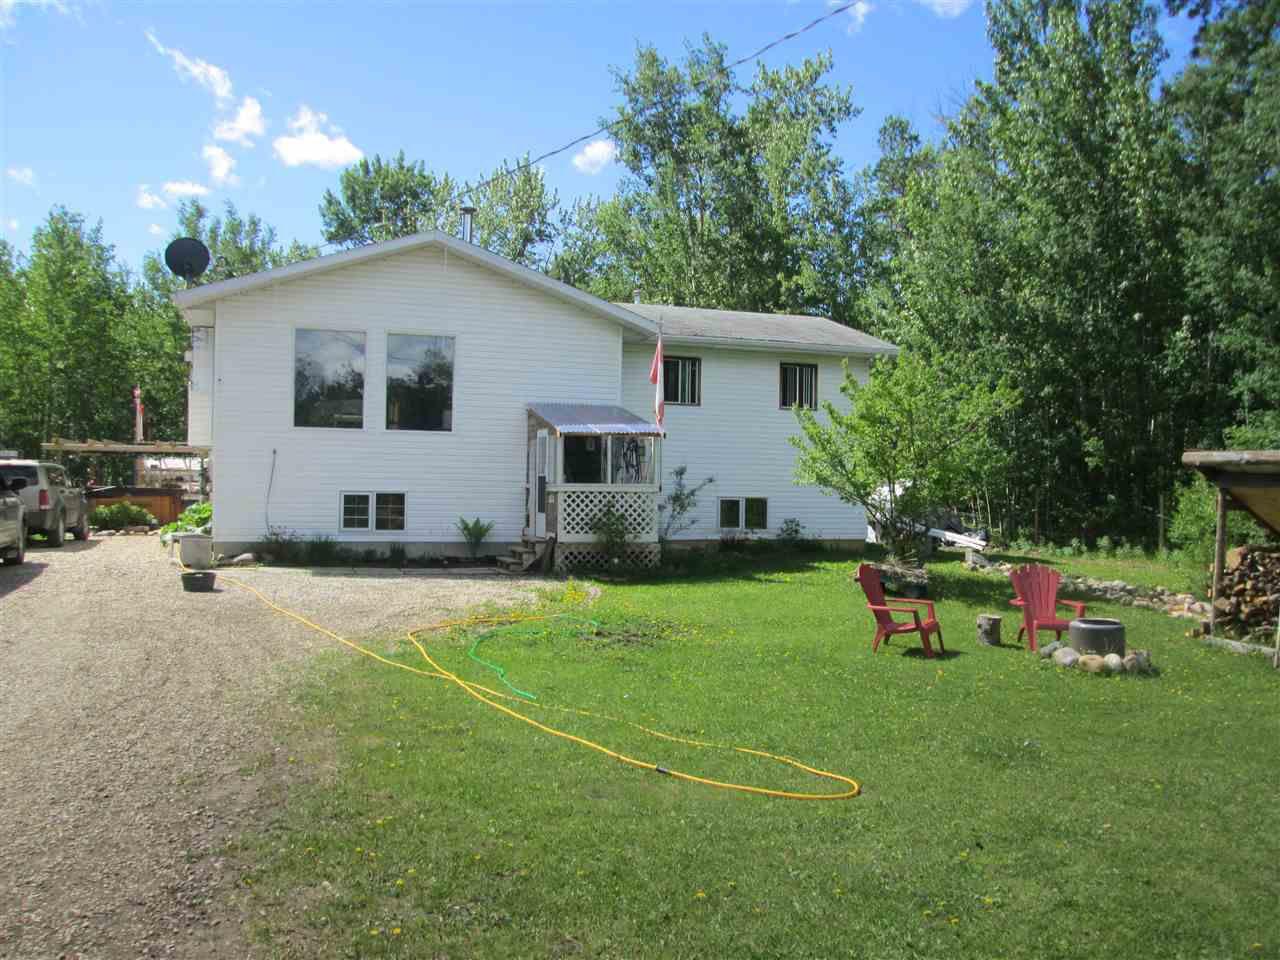 Main Photo: 28-54104 RR35: Rural Lac Ste. Anne County House for sale : MLS®# E4160377